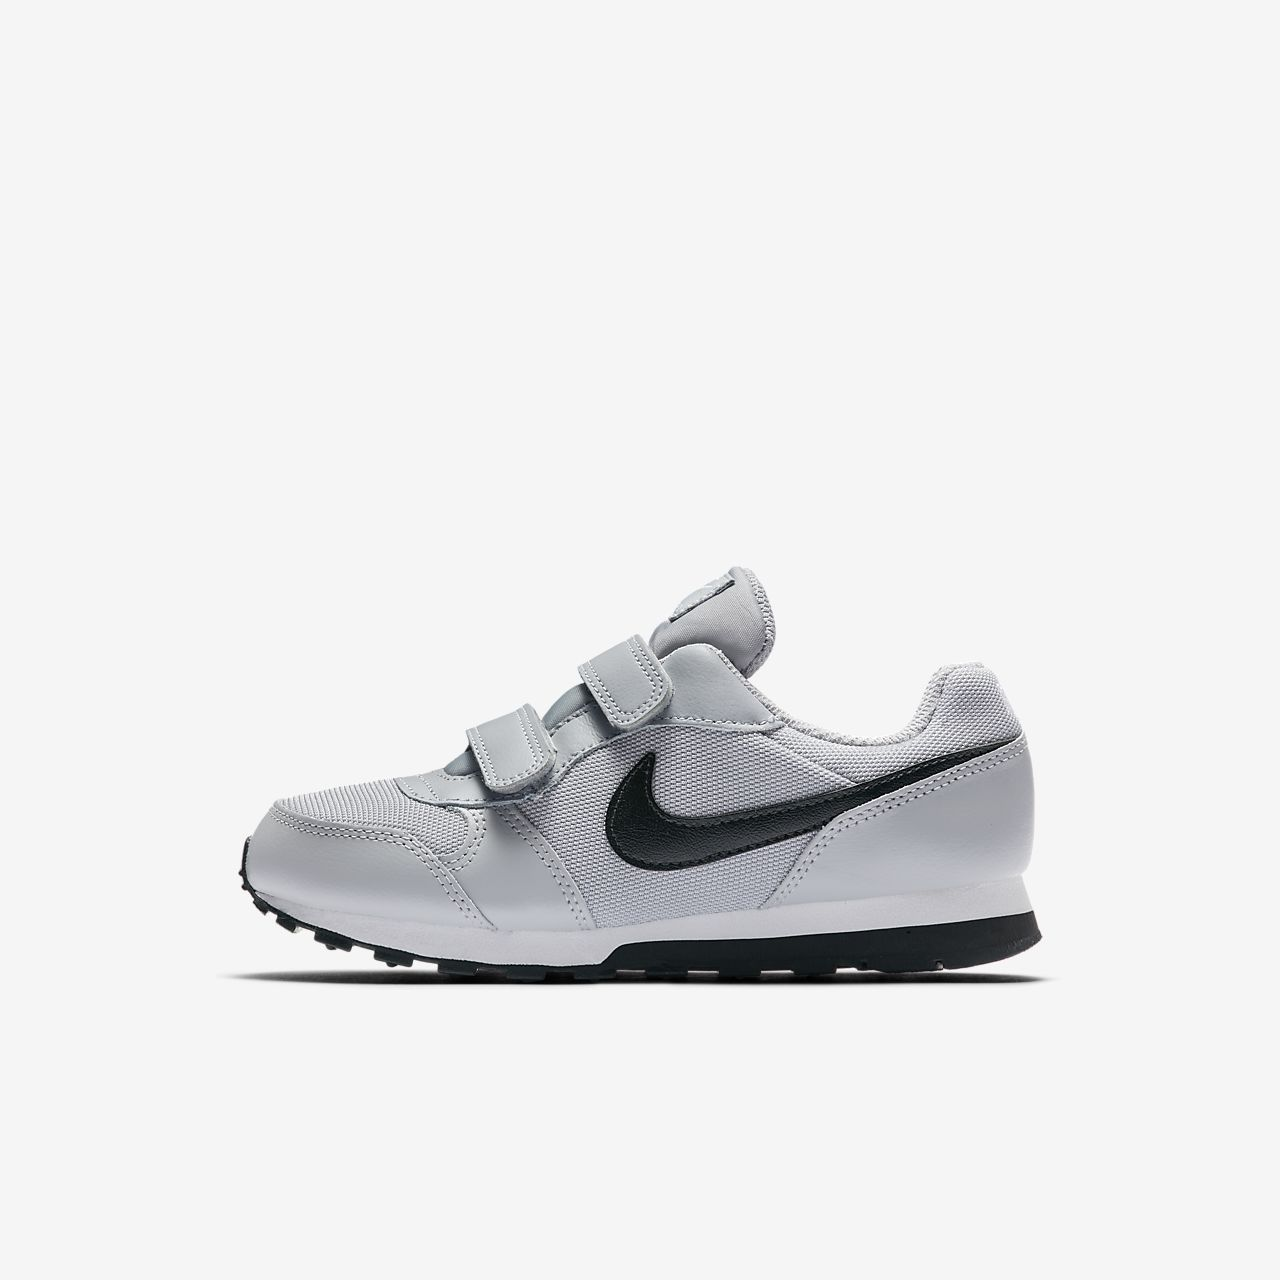 4c2725c3acf6a2 Nike MD Runner 2 Younger Kids  Shoe. Nike.com SG